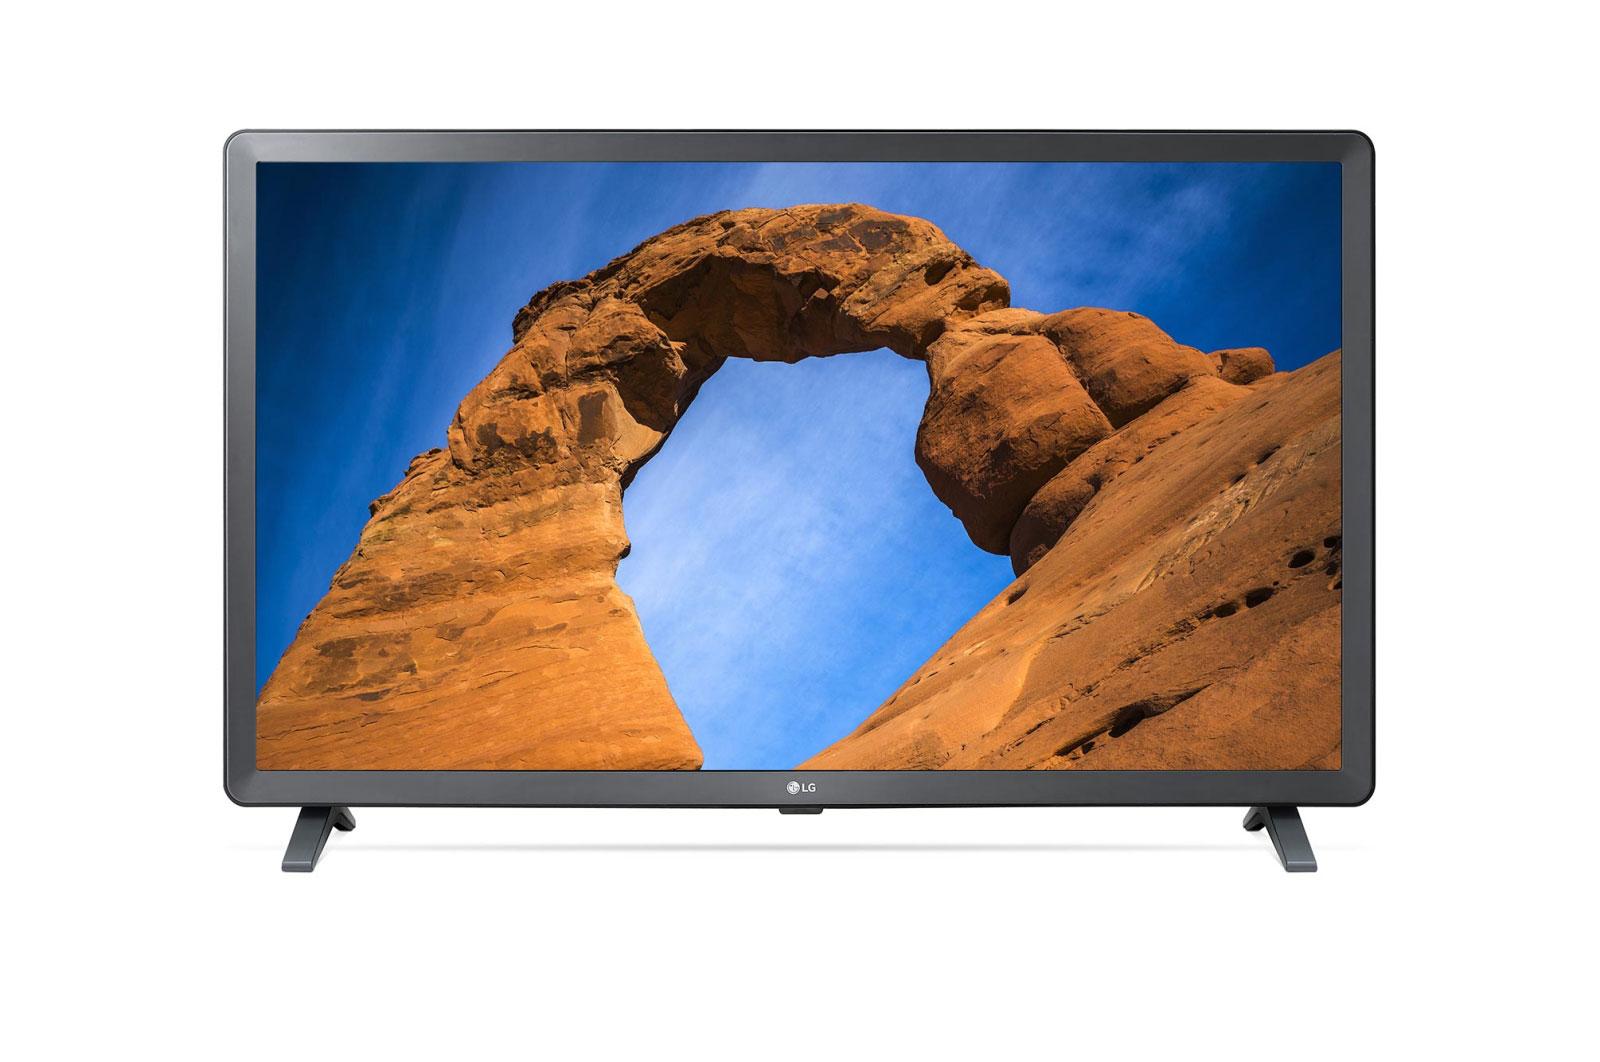 Televizor LED LG Smart TV 32LK610BPLB 80cm HD Ready Negru